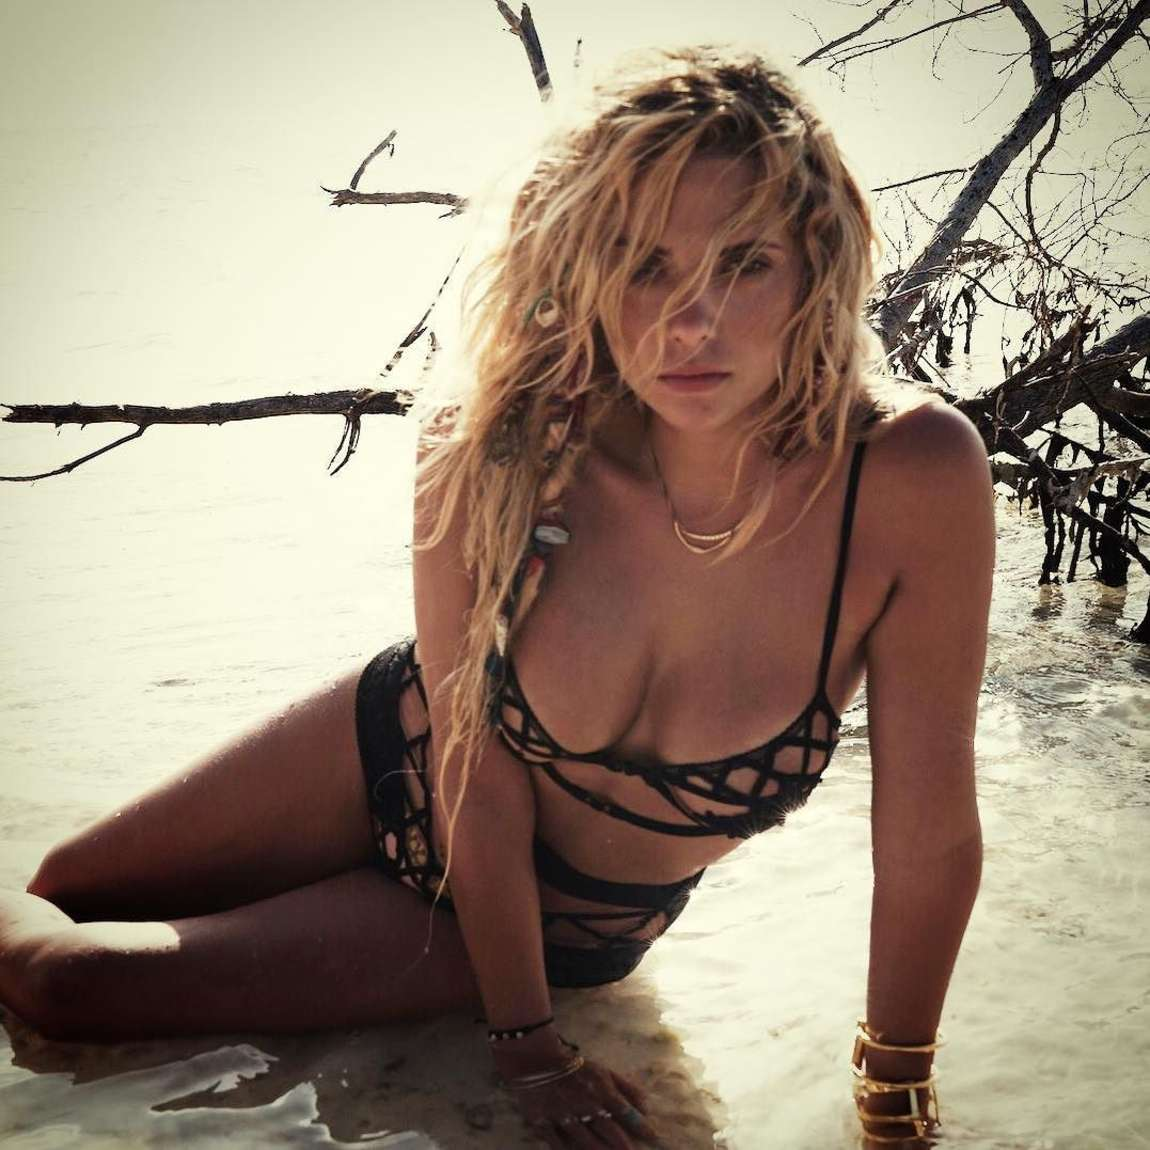 Ashley Benson Hot in Bikini - Instagram